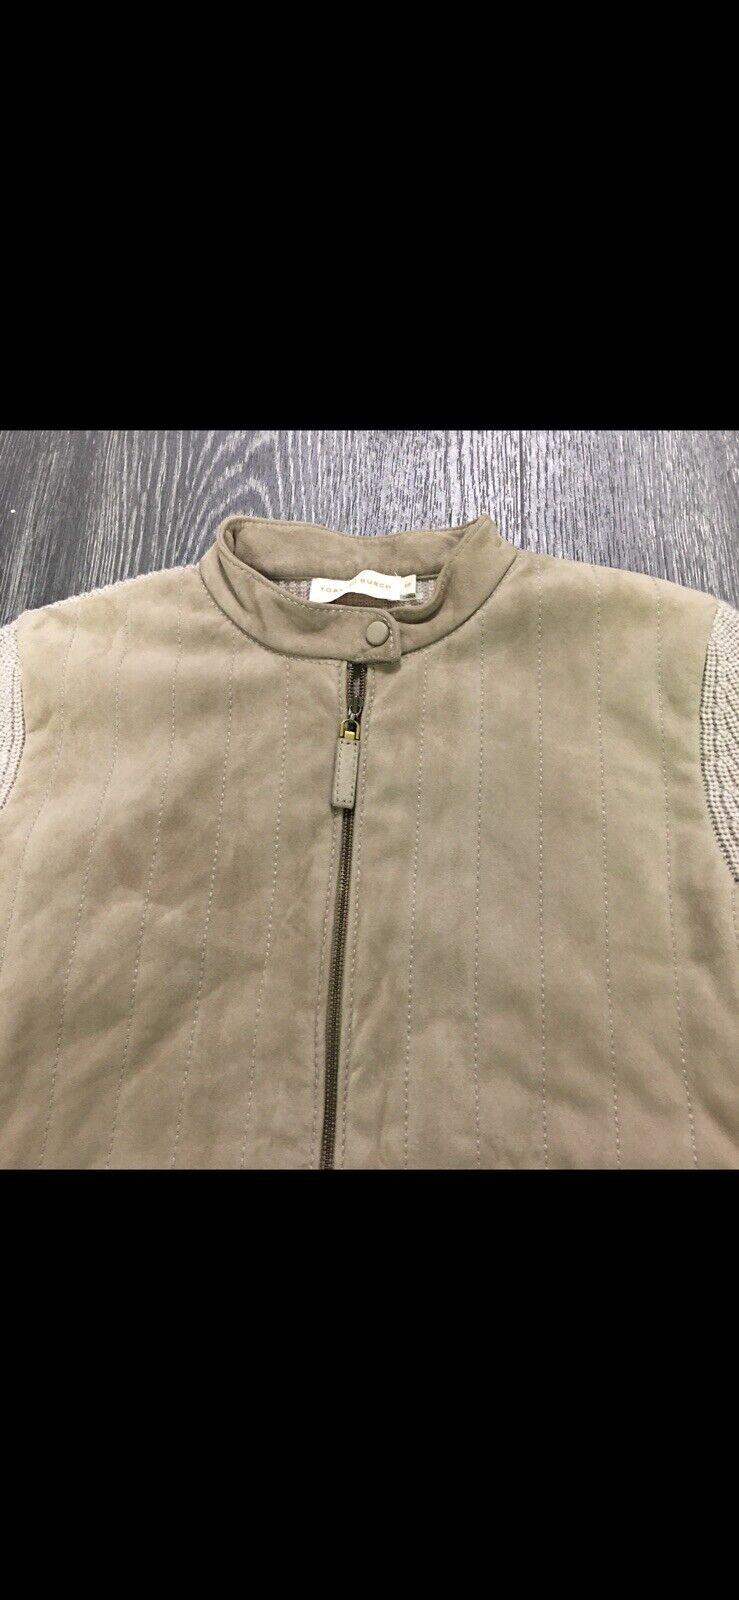 Tory Burch Wool/Suede Cardigan Blazer Size Small  - image 2